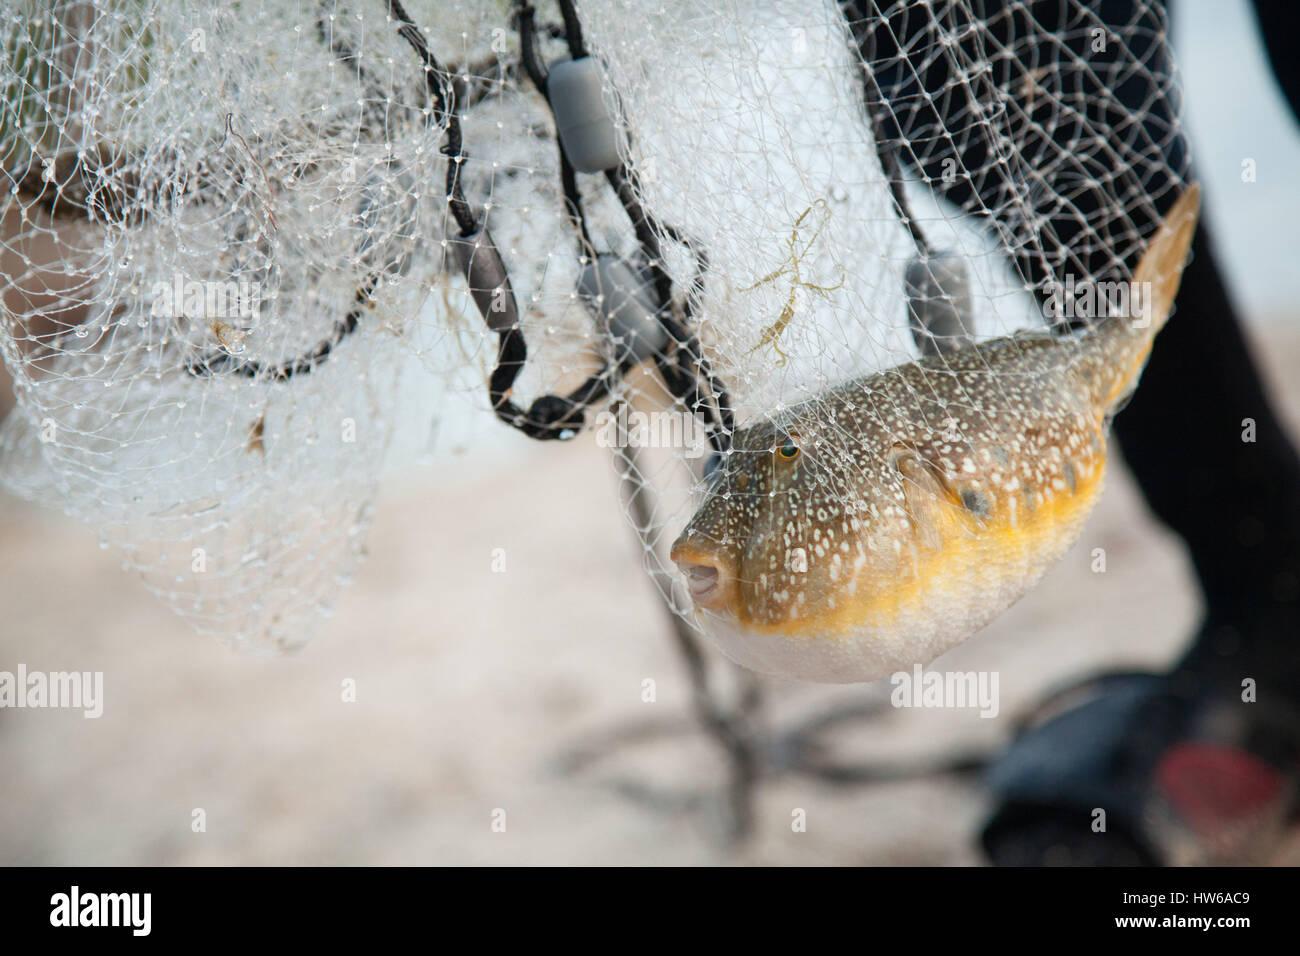 Fish in net - Stock Image